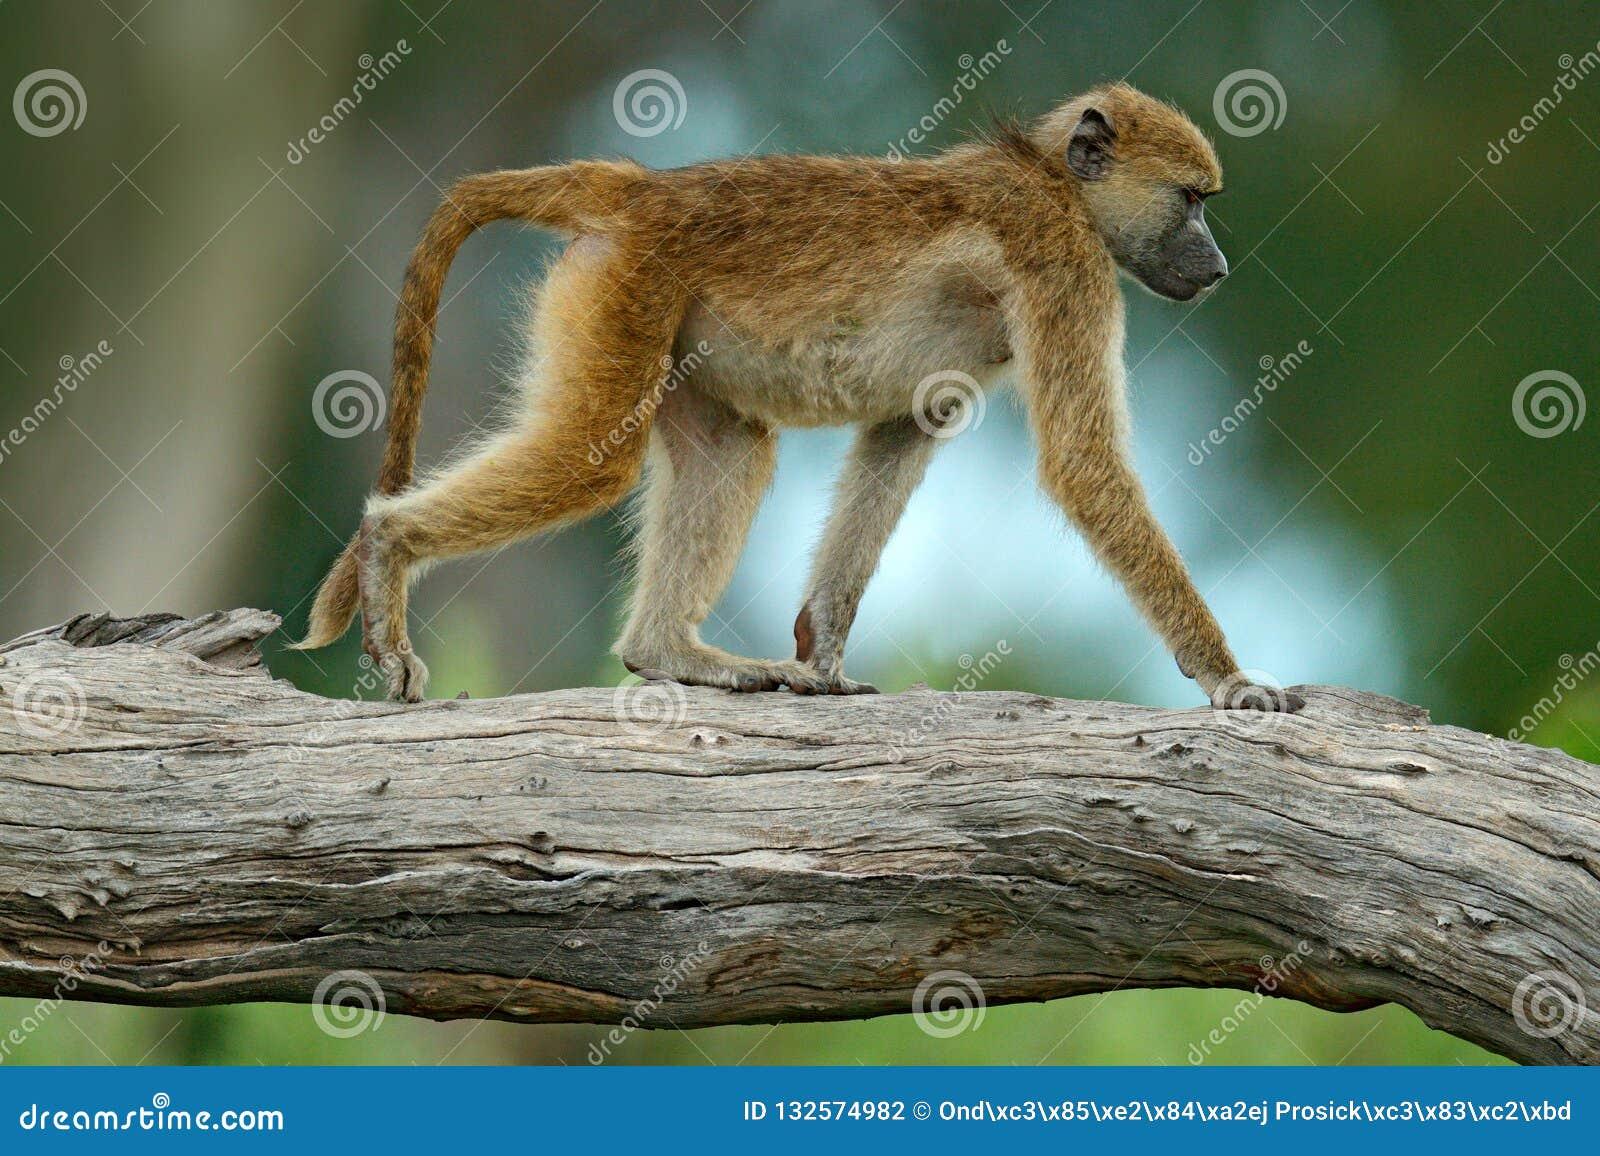 Chacma baboon, Papio ursinus, monkey from Moremi, Okavango delta, Botswana. Wild mammal in the nature habitat. Monkey feeding